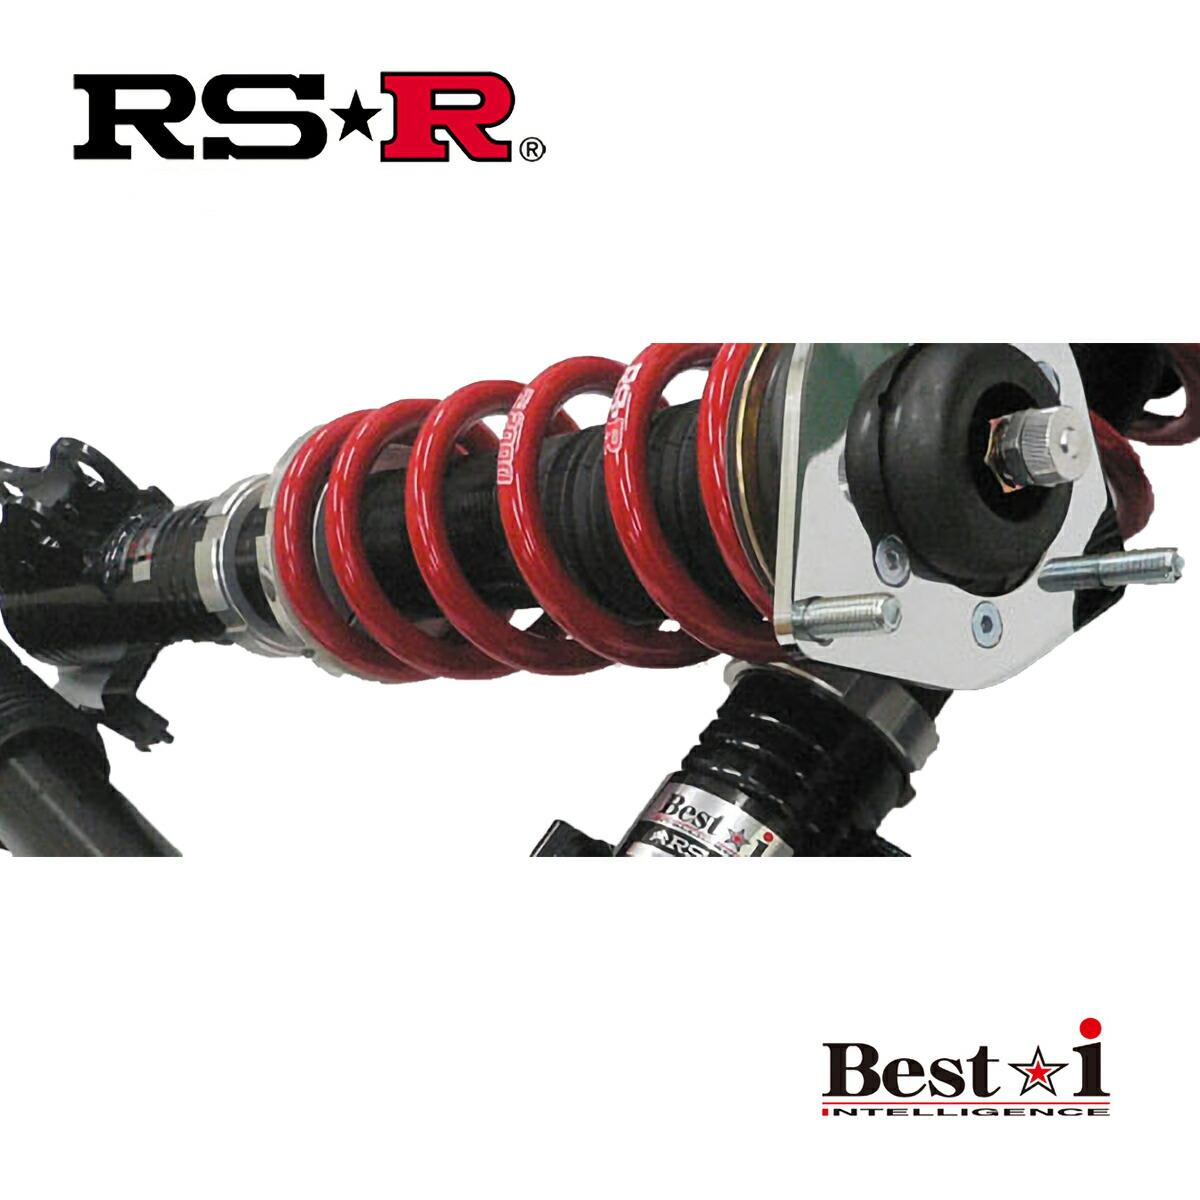 RS-R クラウン GRS203 ロイヤルサルーンiーFour 車高調 リア車高調整:全長式 LIT291M ベストi RSR 個人宅発送追金有